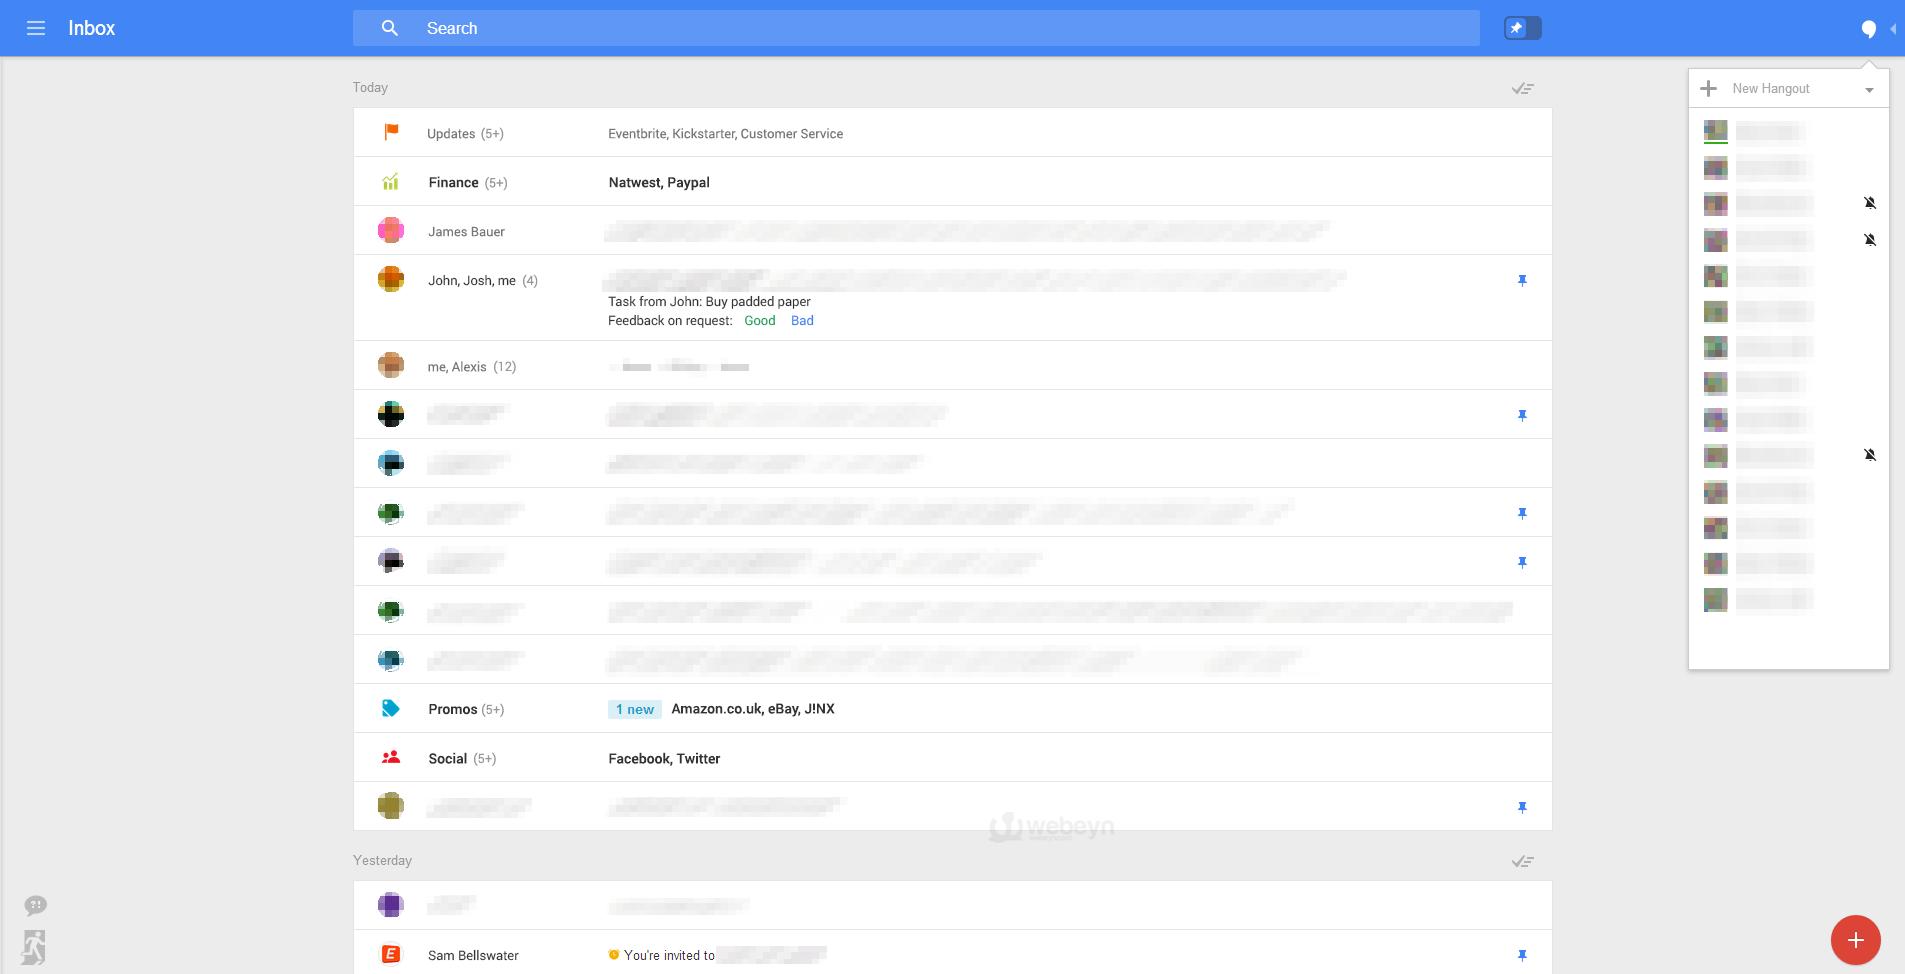 Yeni-Gmail-arayuzu-webeyn-2